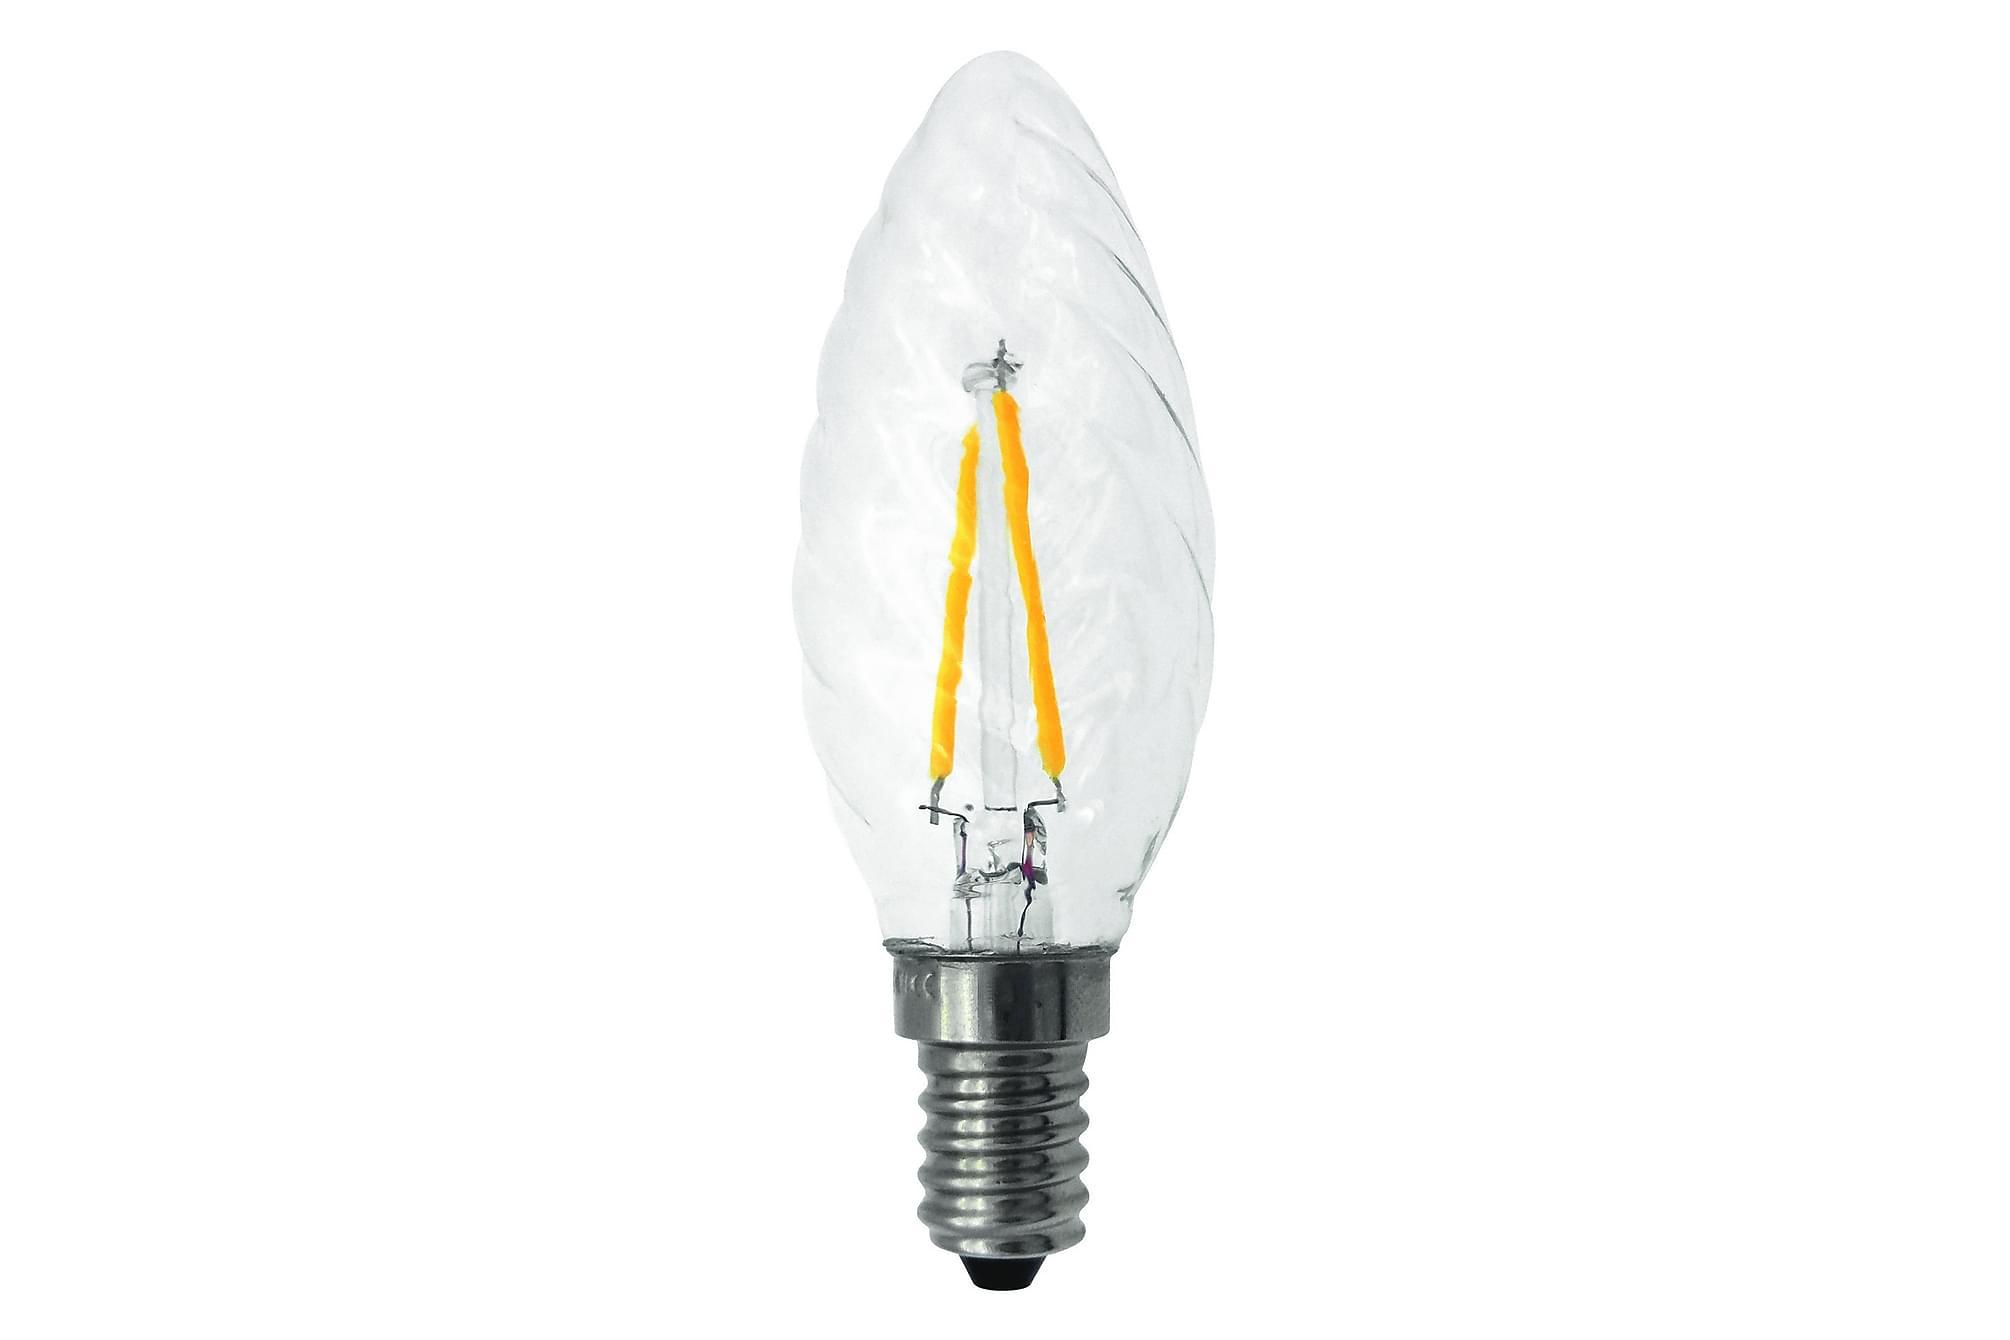 JUNG LED-lampa 1,8W E14 Filament, Glödlampor & ljuskällor